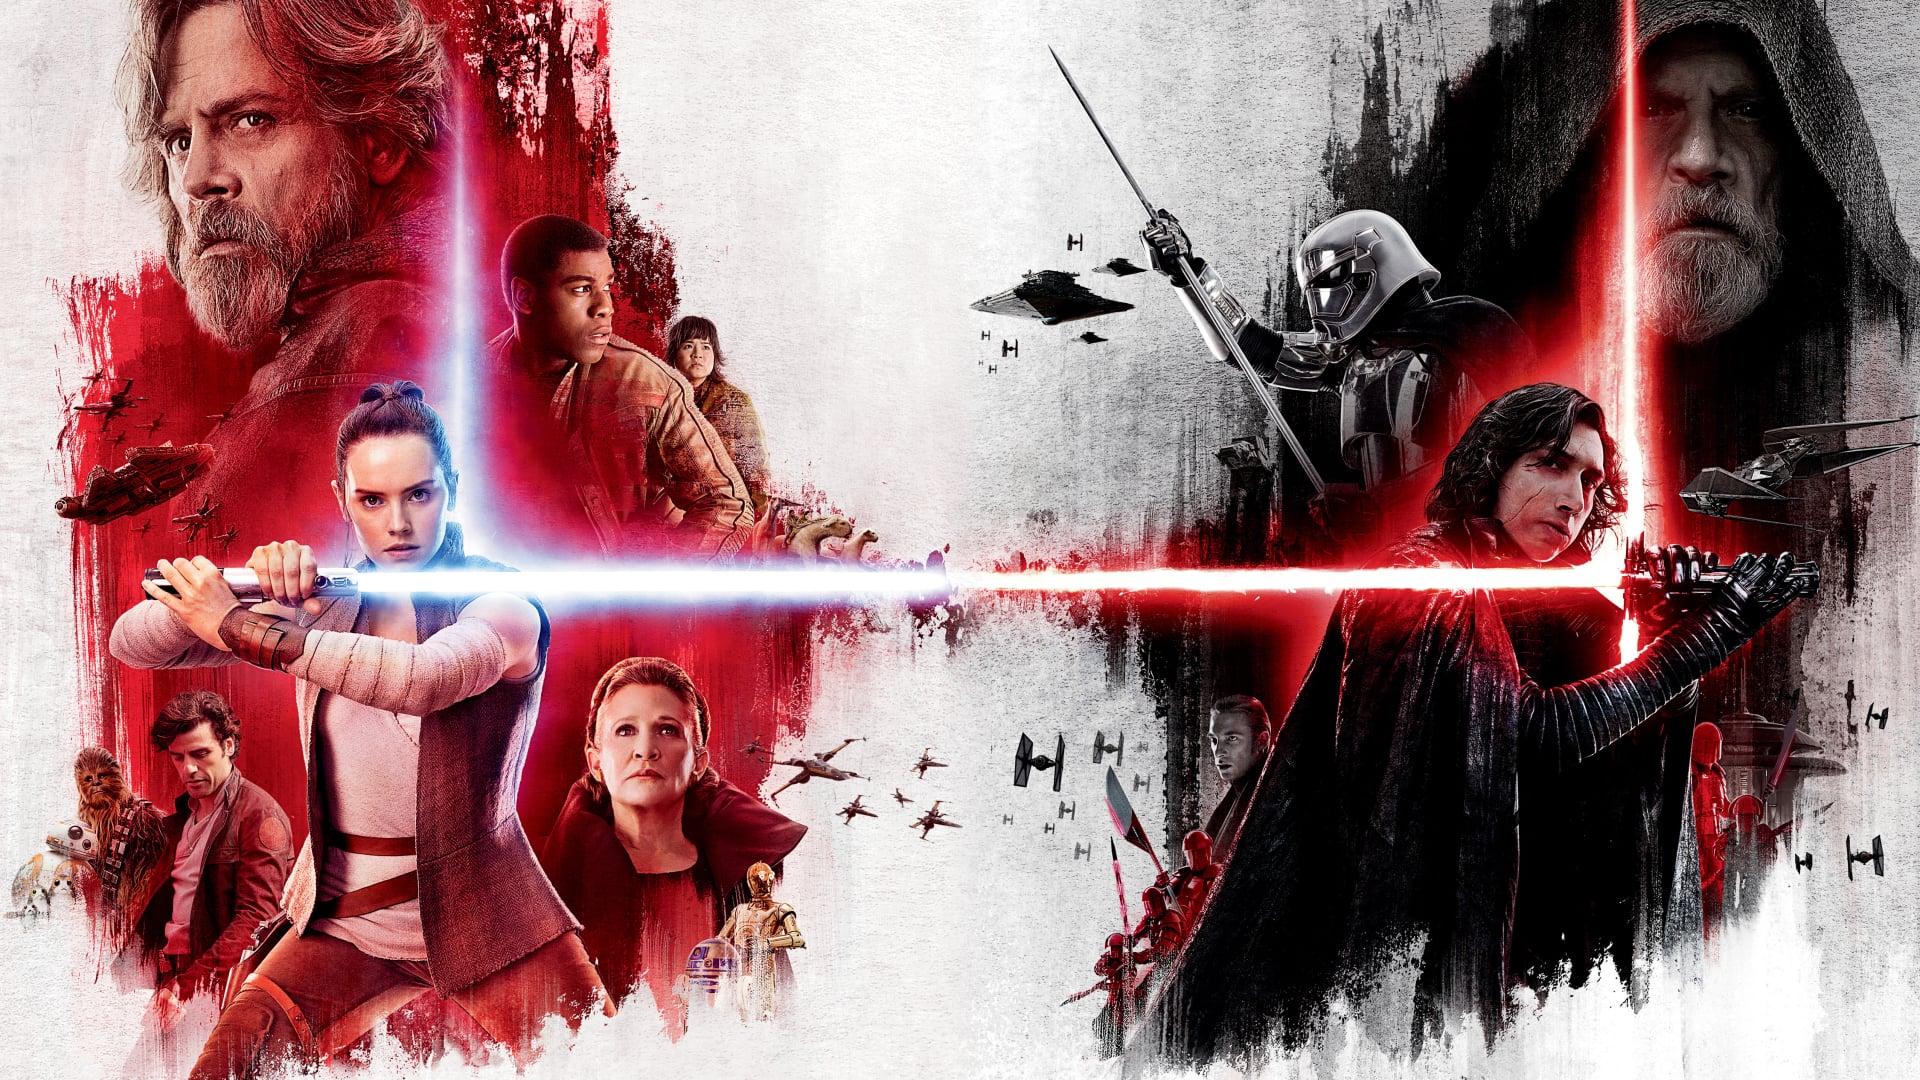 Regarder Star Wars, épisode VIII : Les Derniers Jedi en streaming gratuit